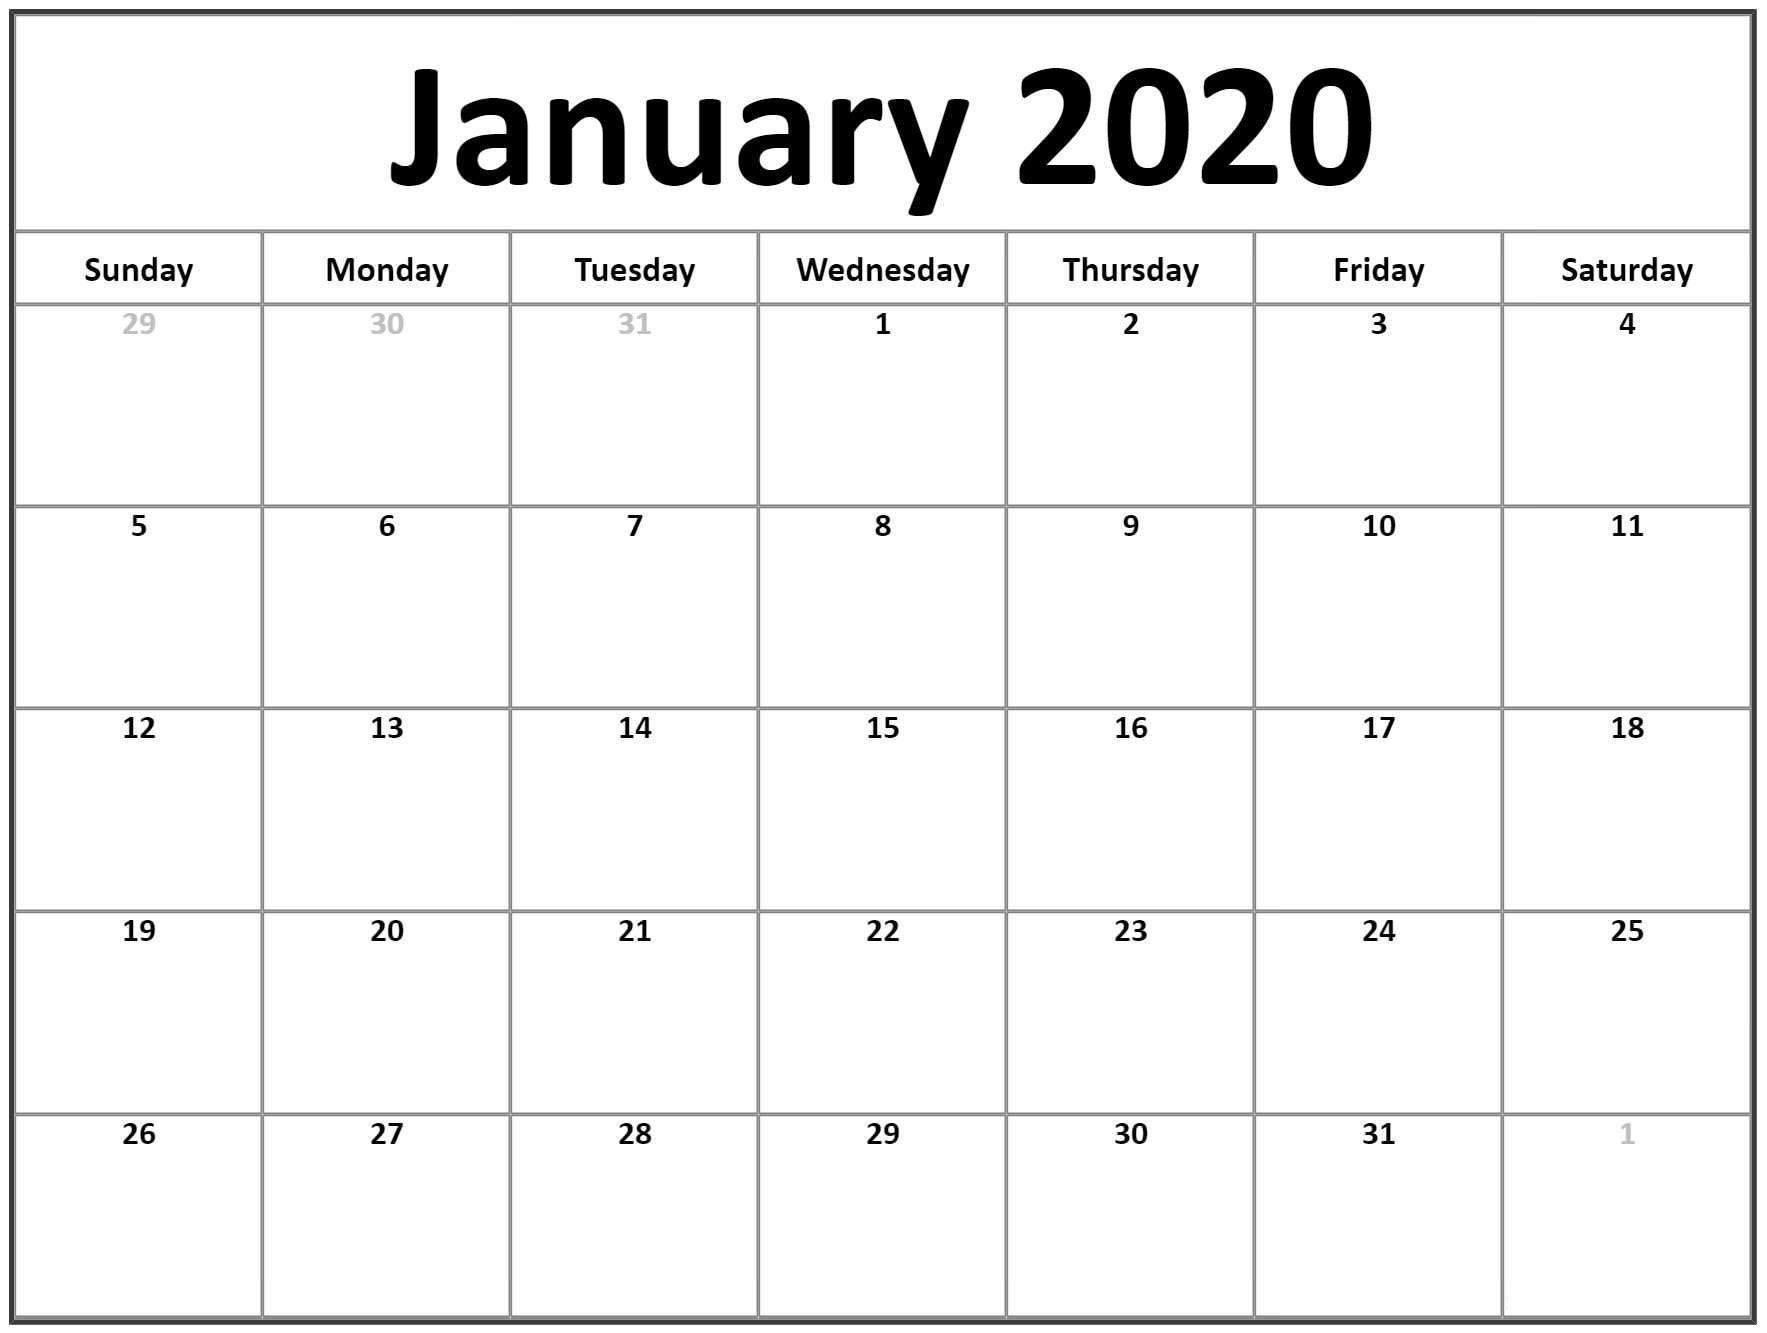 January 2020 Blank Calendar Printable Word Pdf Template